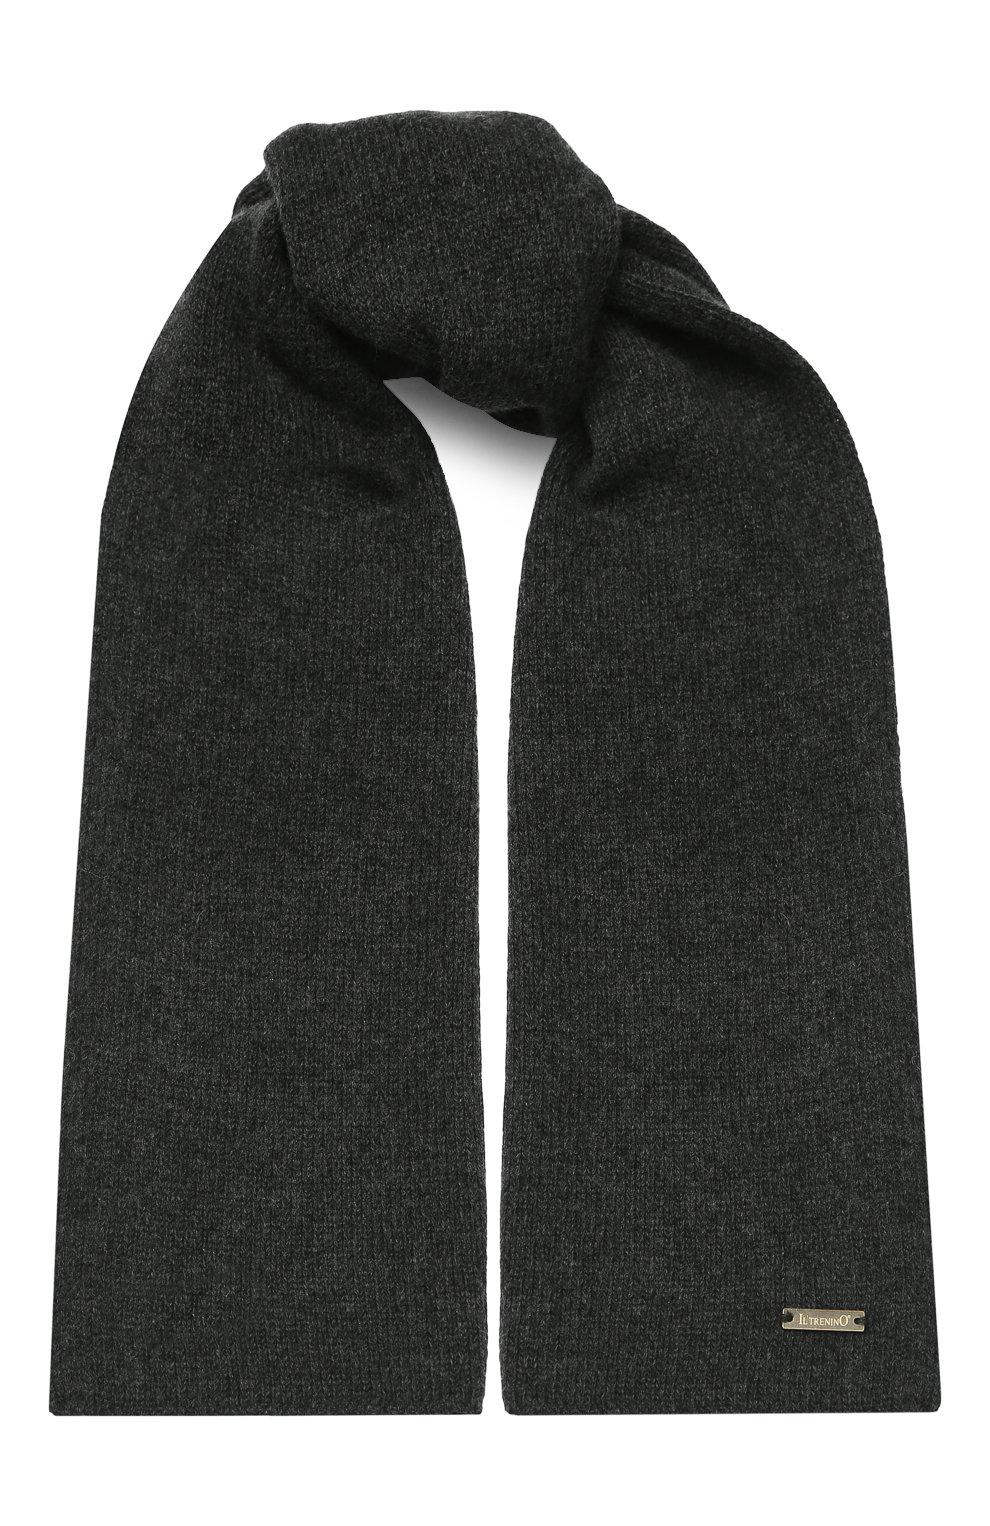 Детский шарф из шерсти и кашемира IL TRENINO темно-серого цвета, арт. 17 5150/E0 | Фото 1